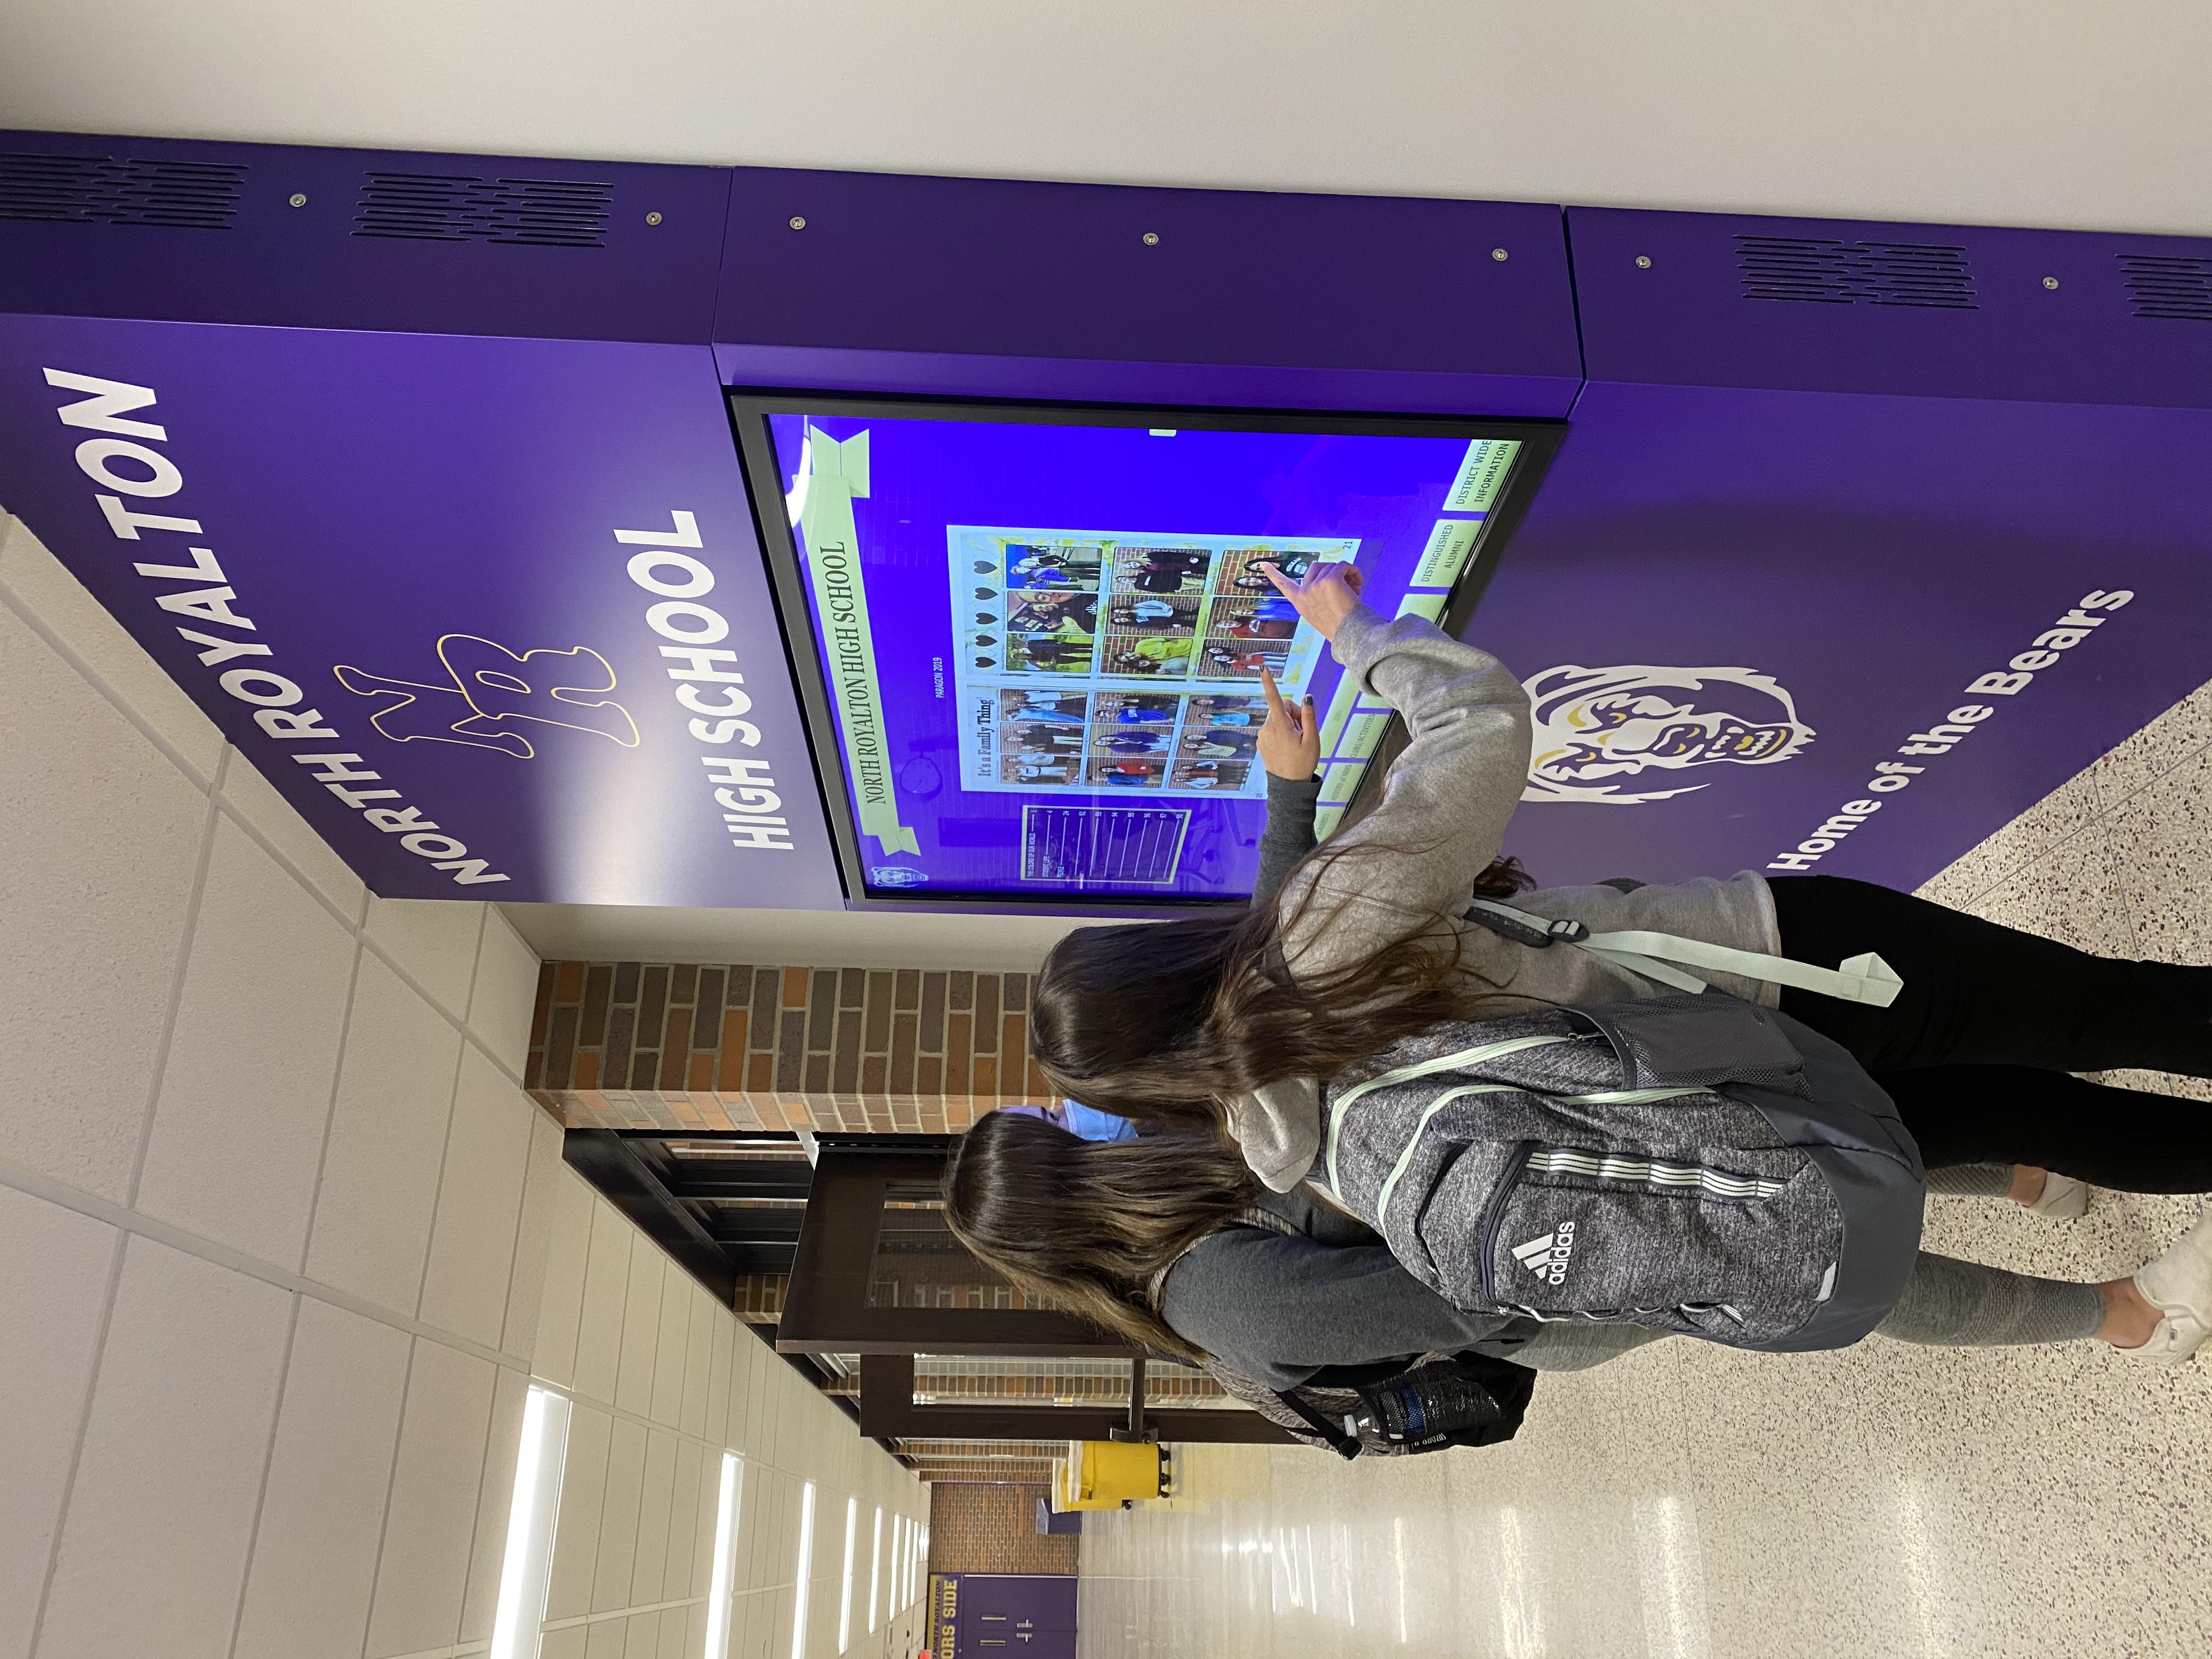 North Royalton High School electronic kiosk